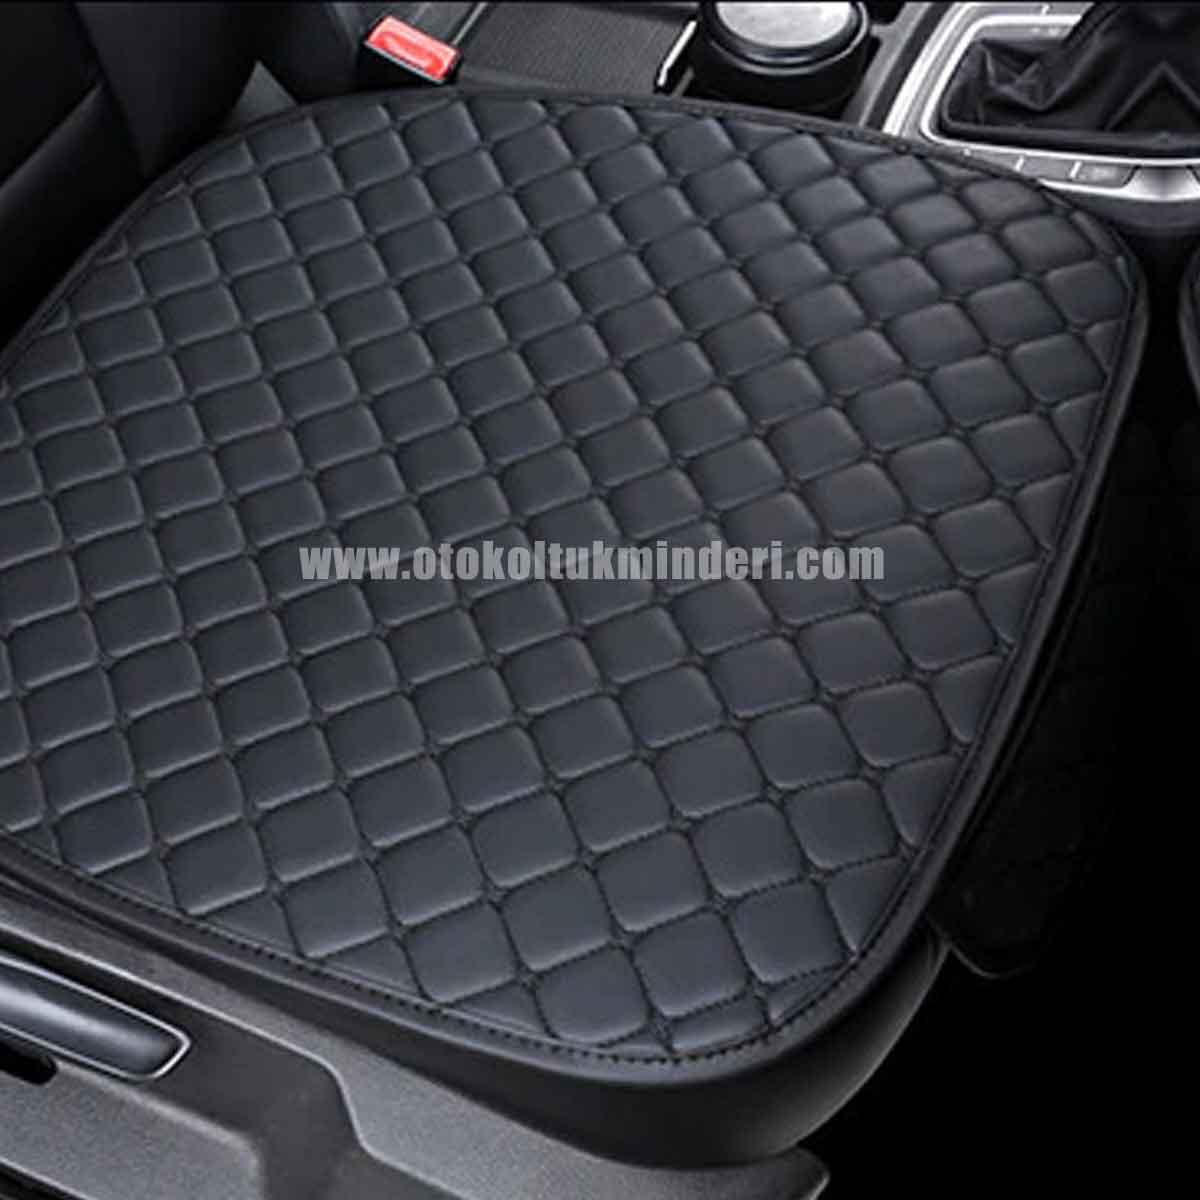 Citroen oto koltuk kılıfı - Citroen Koltuk minderi Siyah Deri Cepli